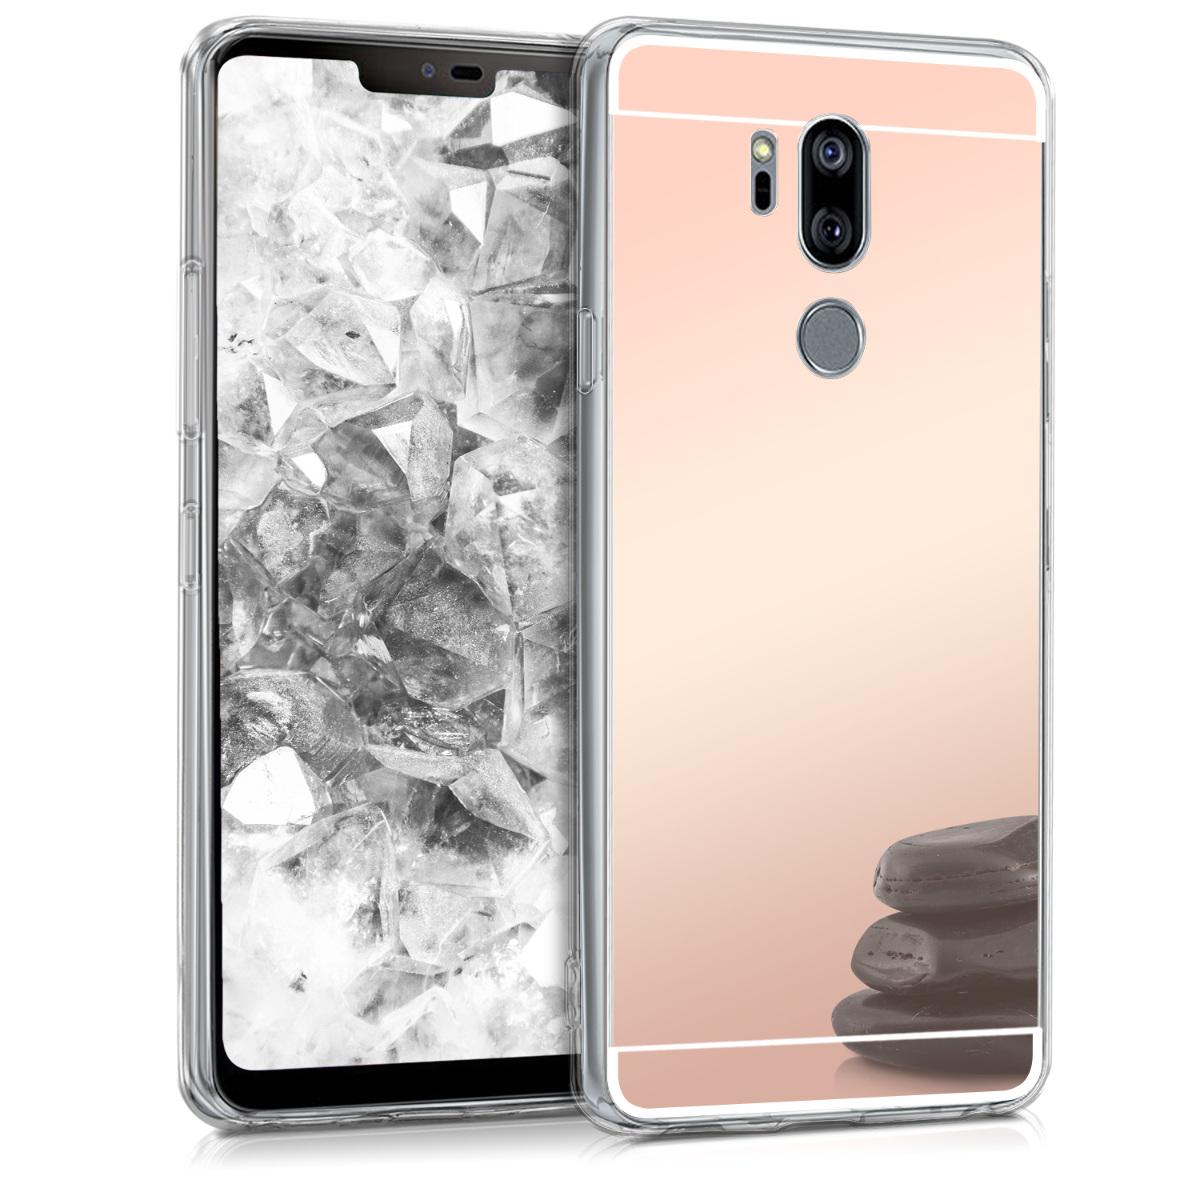 KW Θήκη Σιλικόνης (TPU) με Καθρέφτη LG G7 ThinQ / Fit / One - Rose Gold Reflective (45160.41)